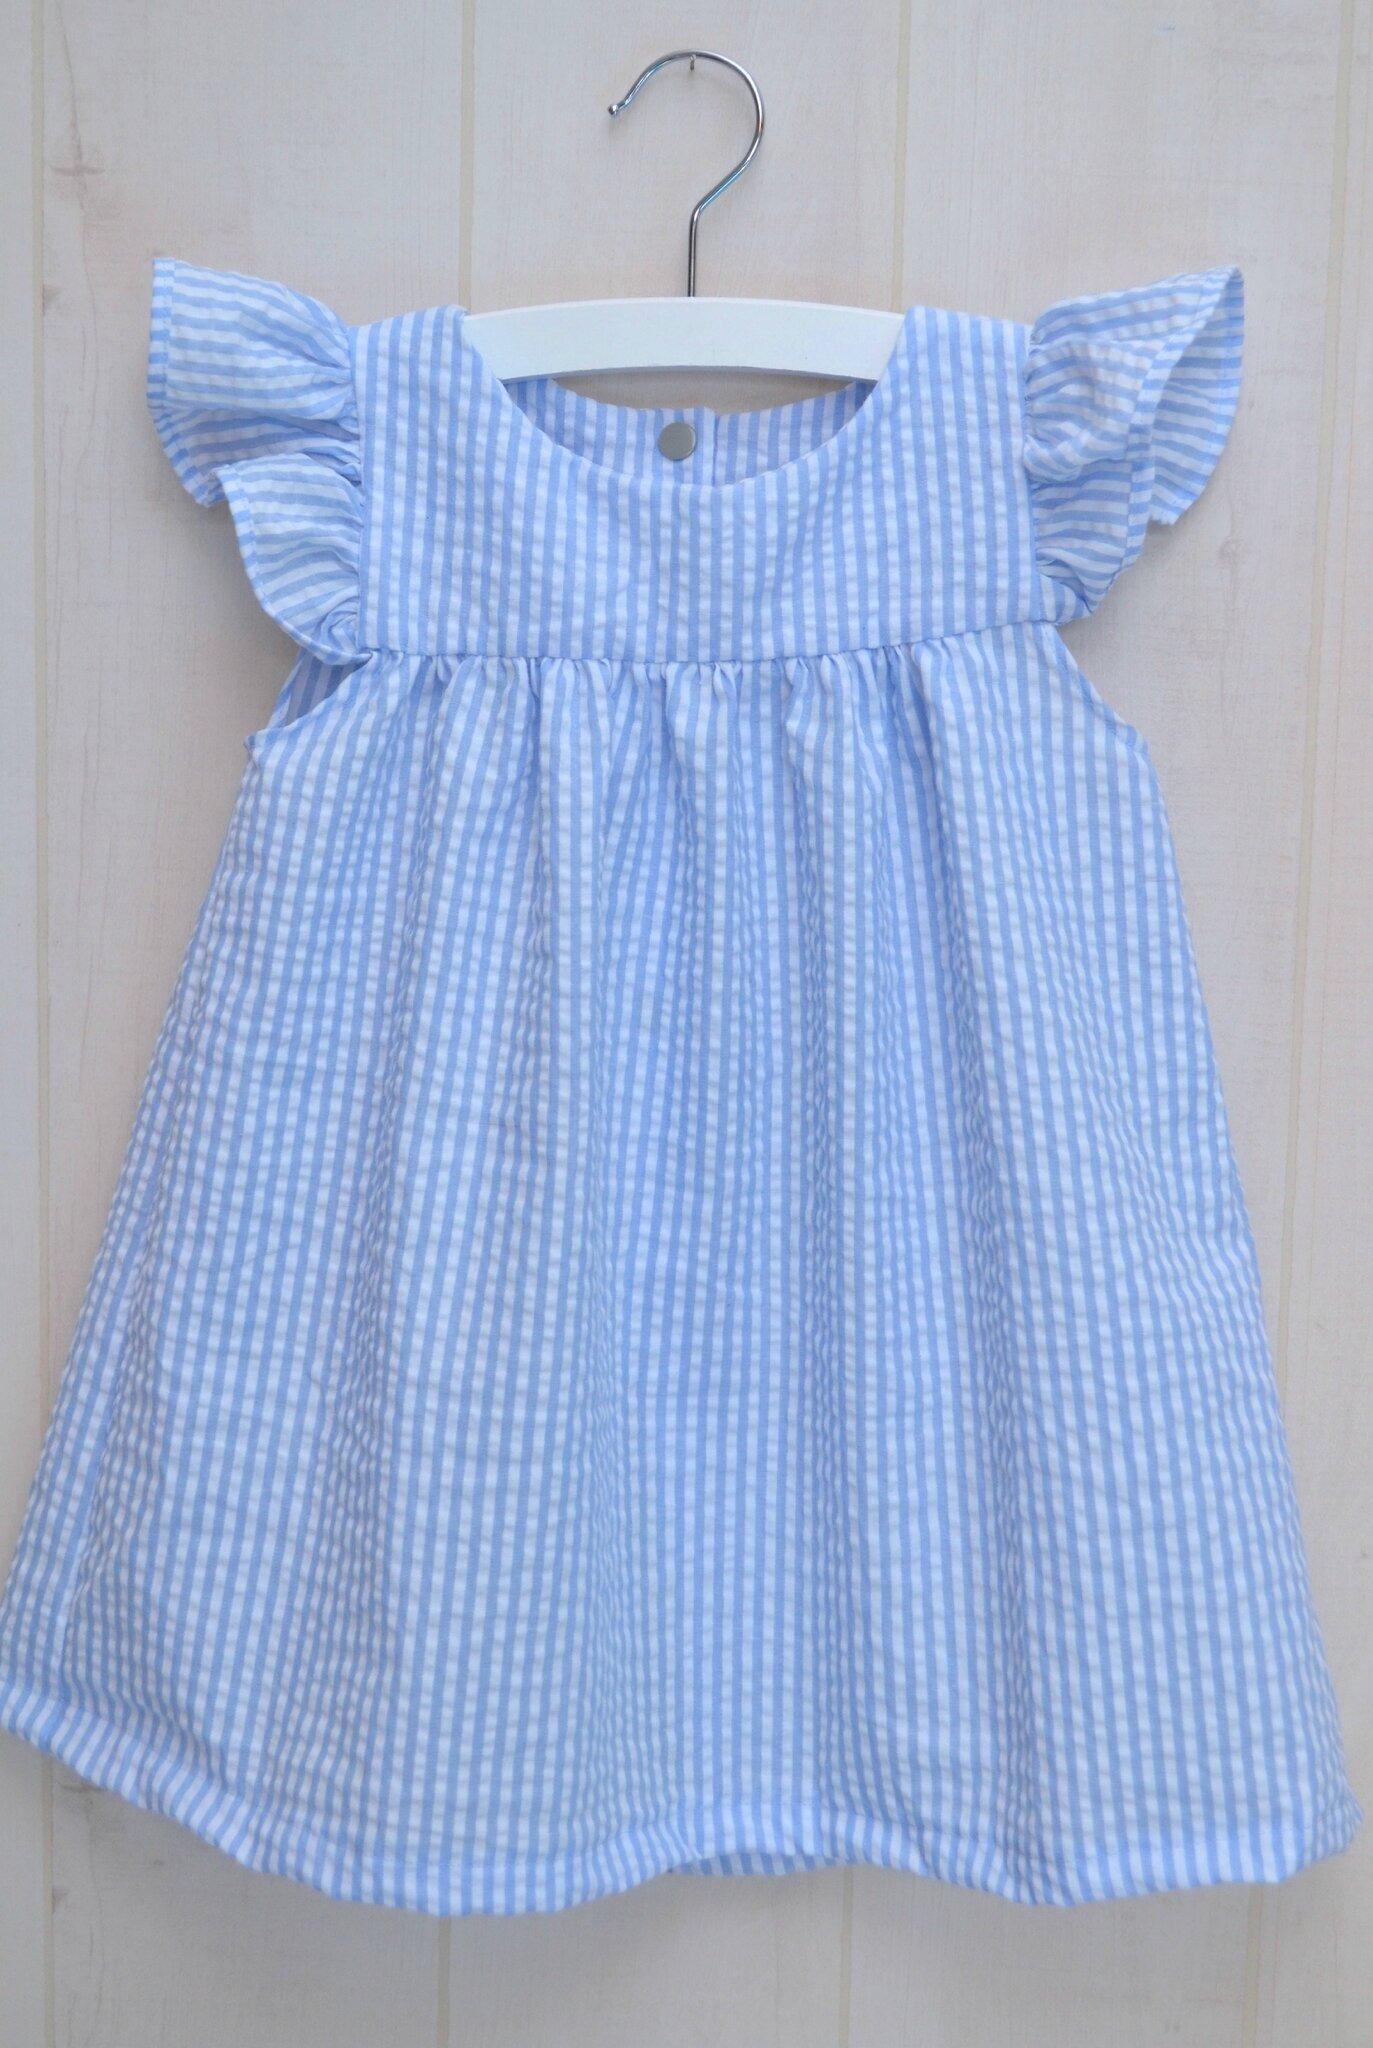 "petite robe ""rétro"""